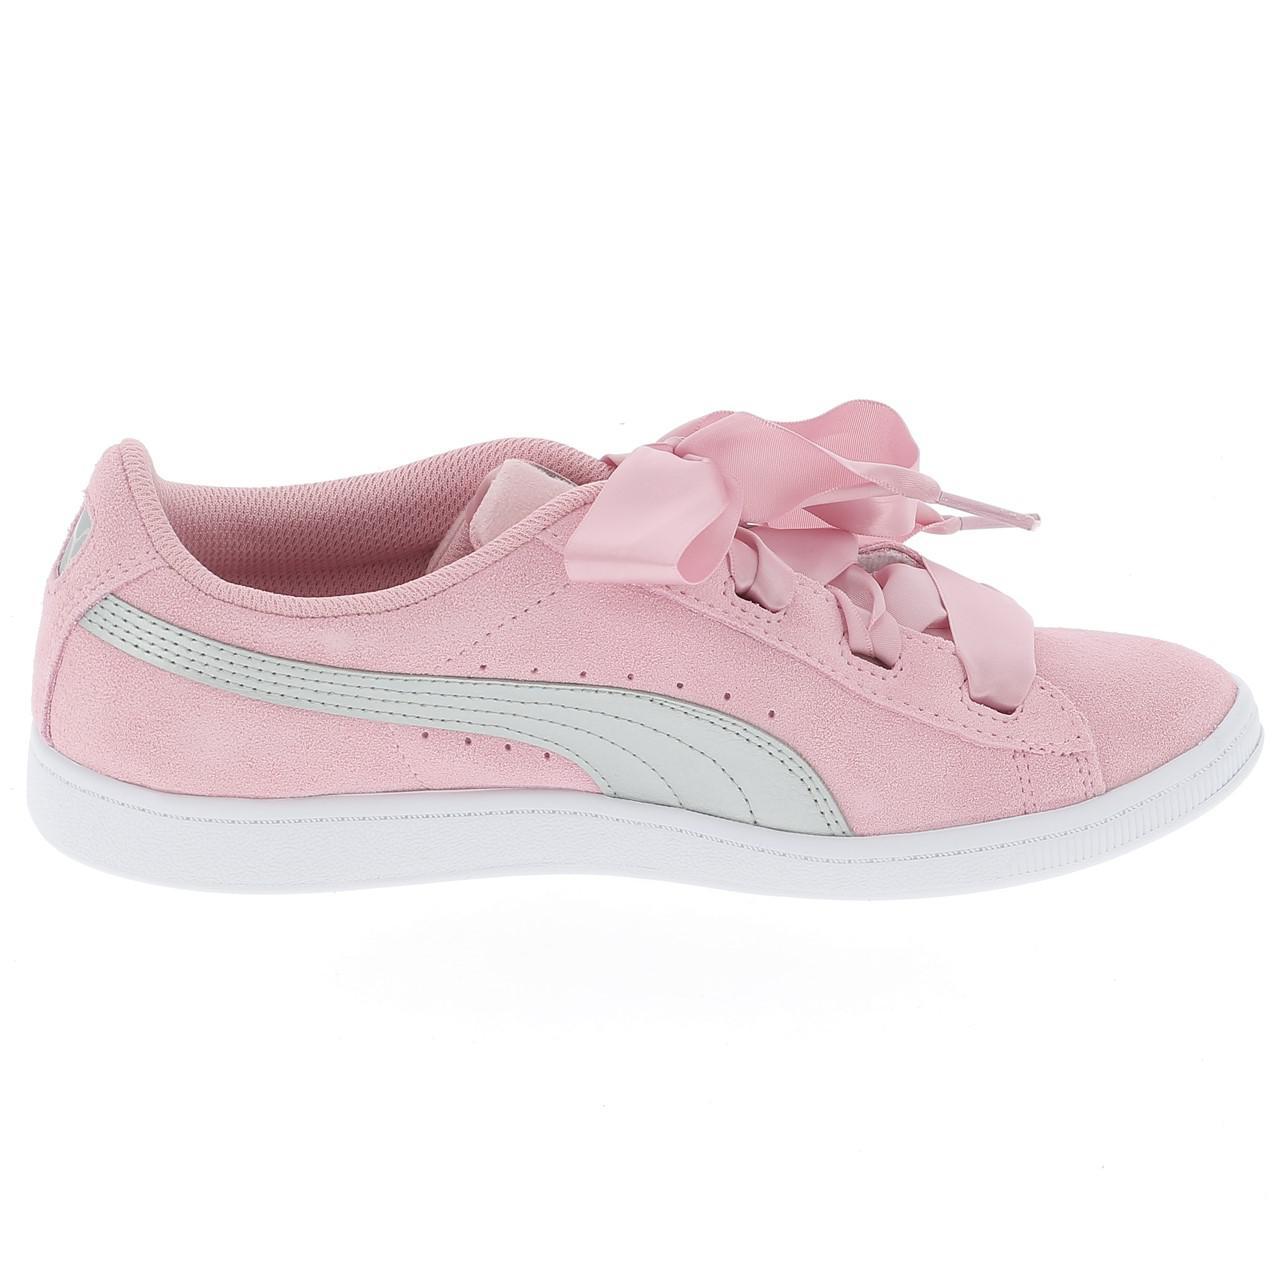 Schuhe-Niedrig-Leder-oder-Faux-Puma-Vikky-Band-Rosa-Maedchen-Rosa-17056-Neu Indexbild 4